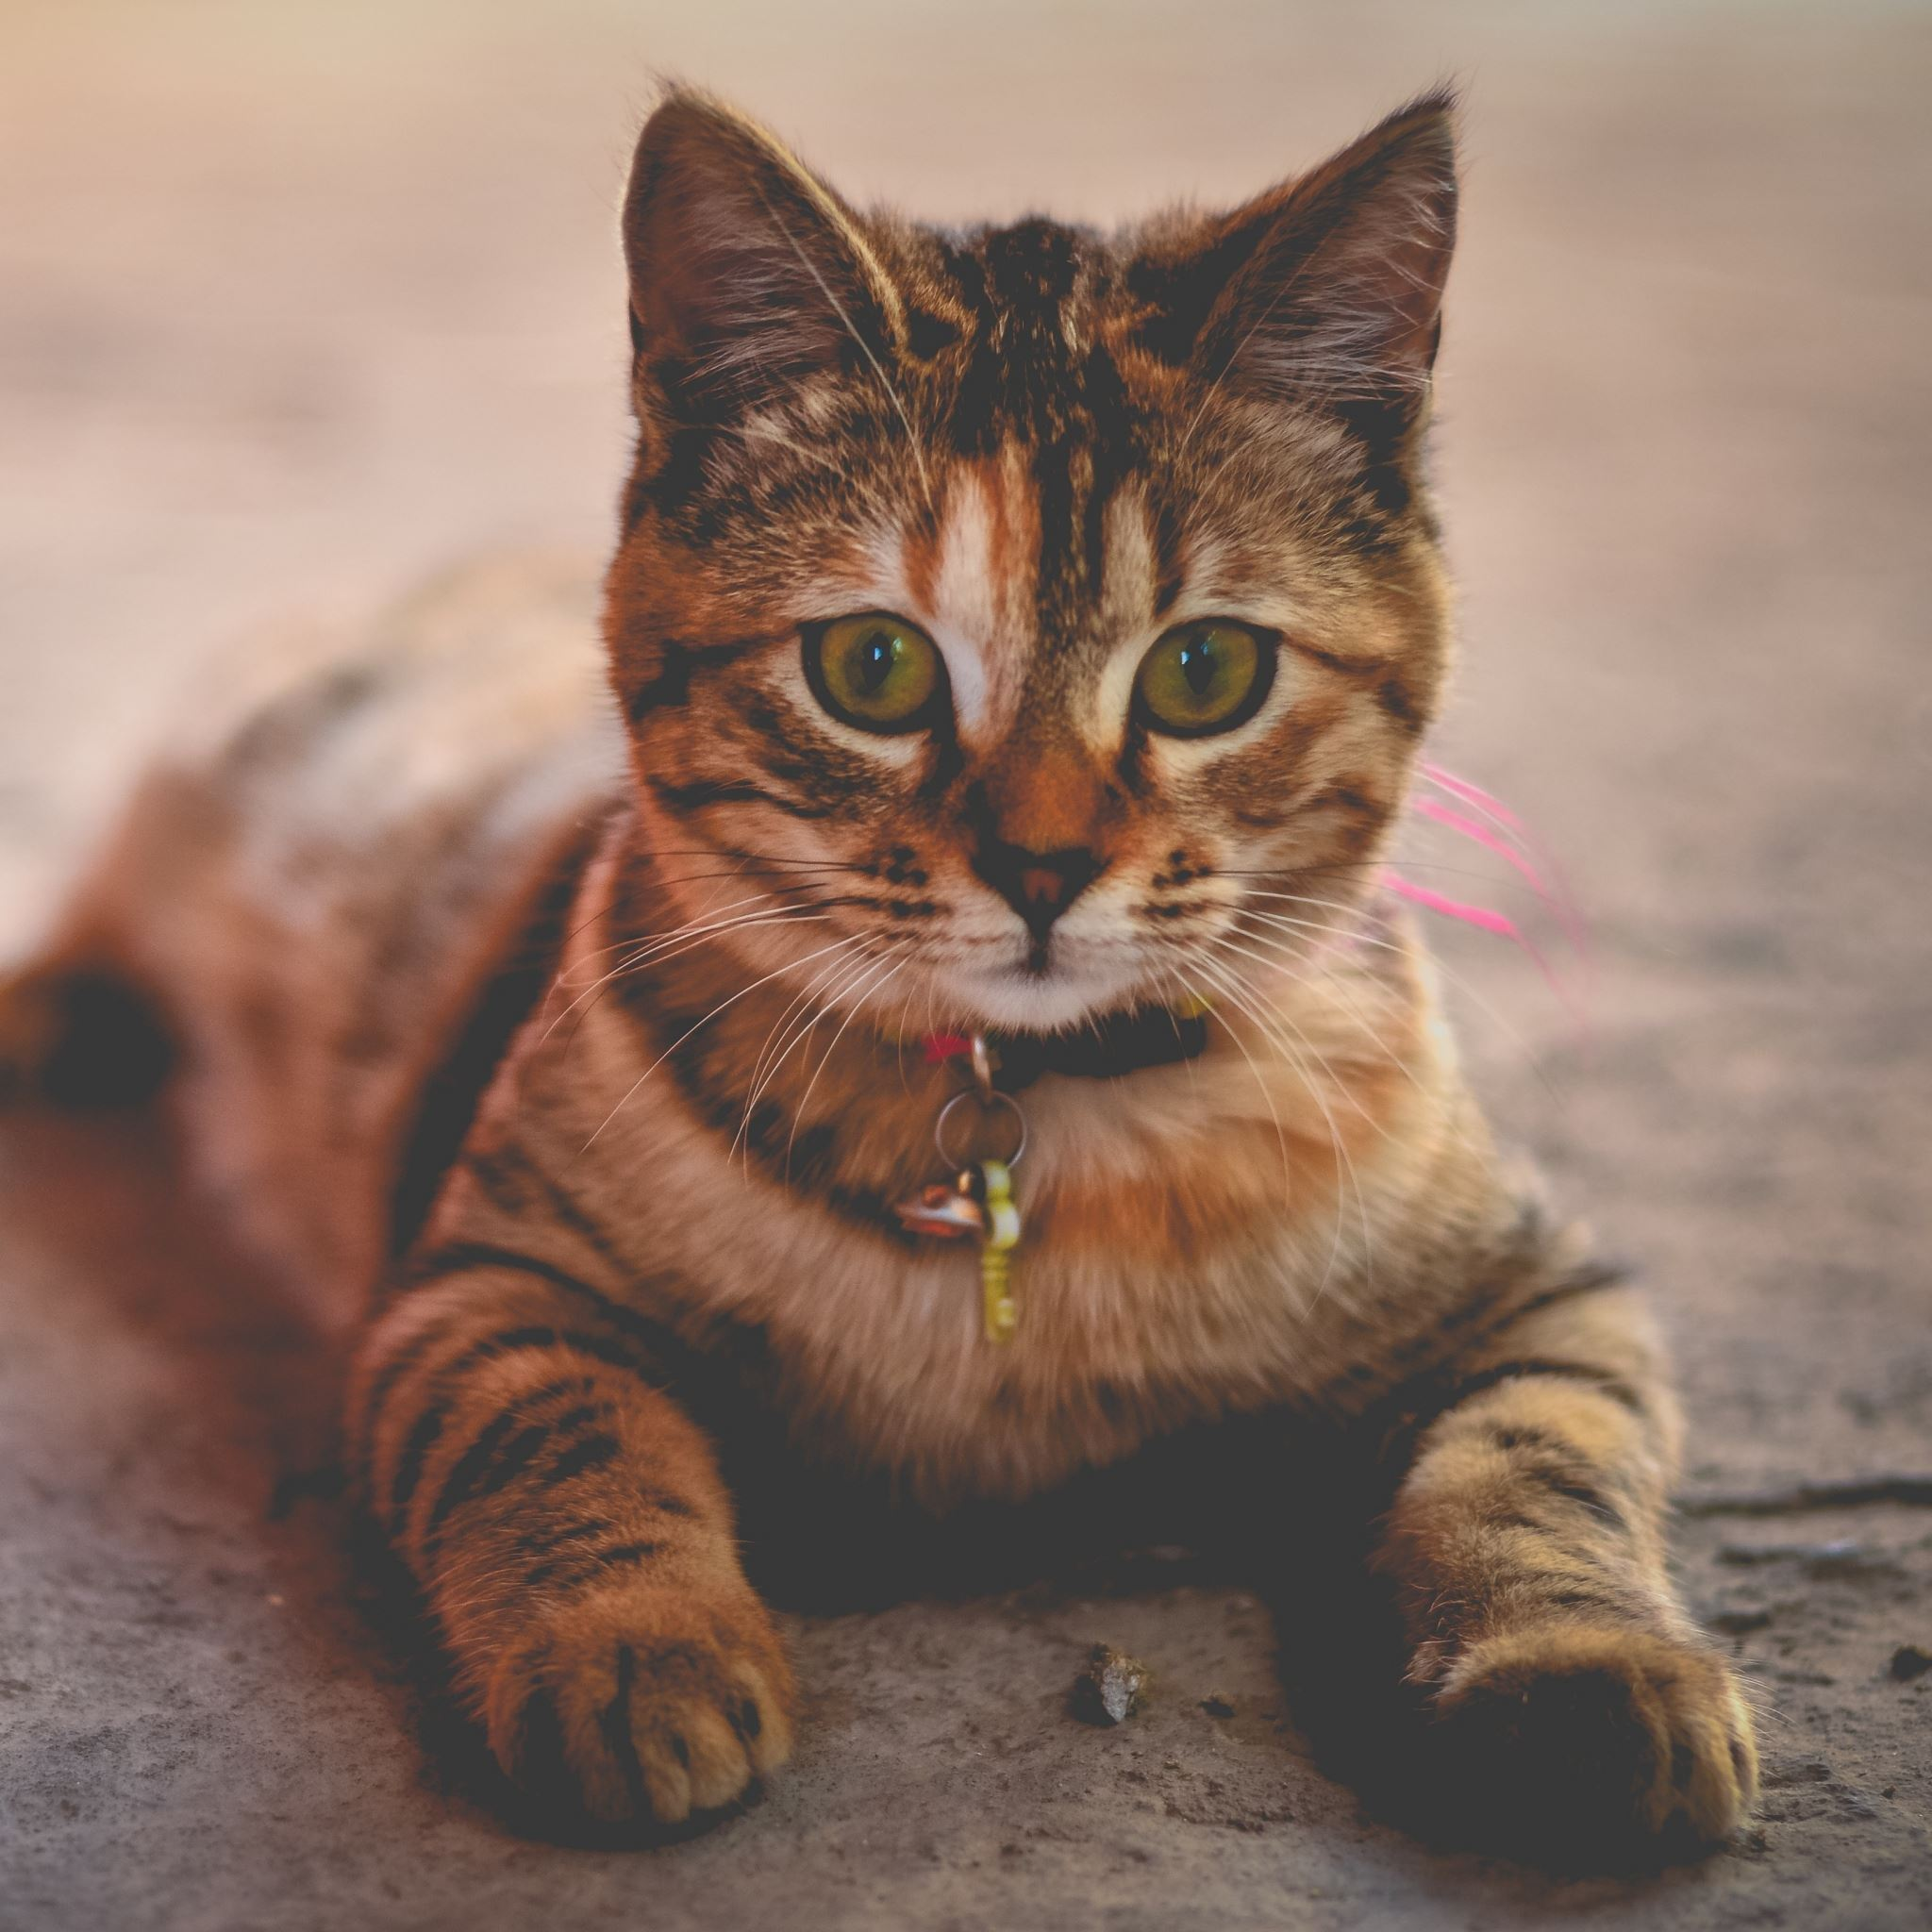 Cat Wallpapers For Iphone: Cat Collar Lying Home IPad Air Wallpaper Download